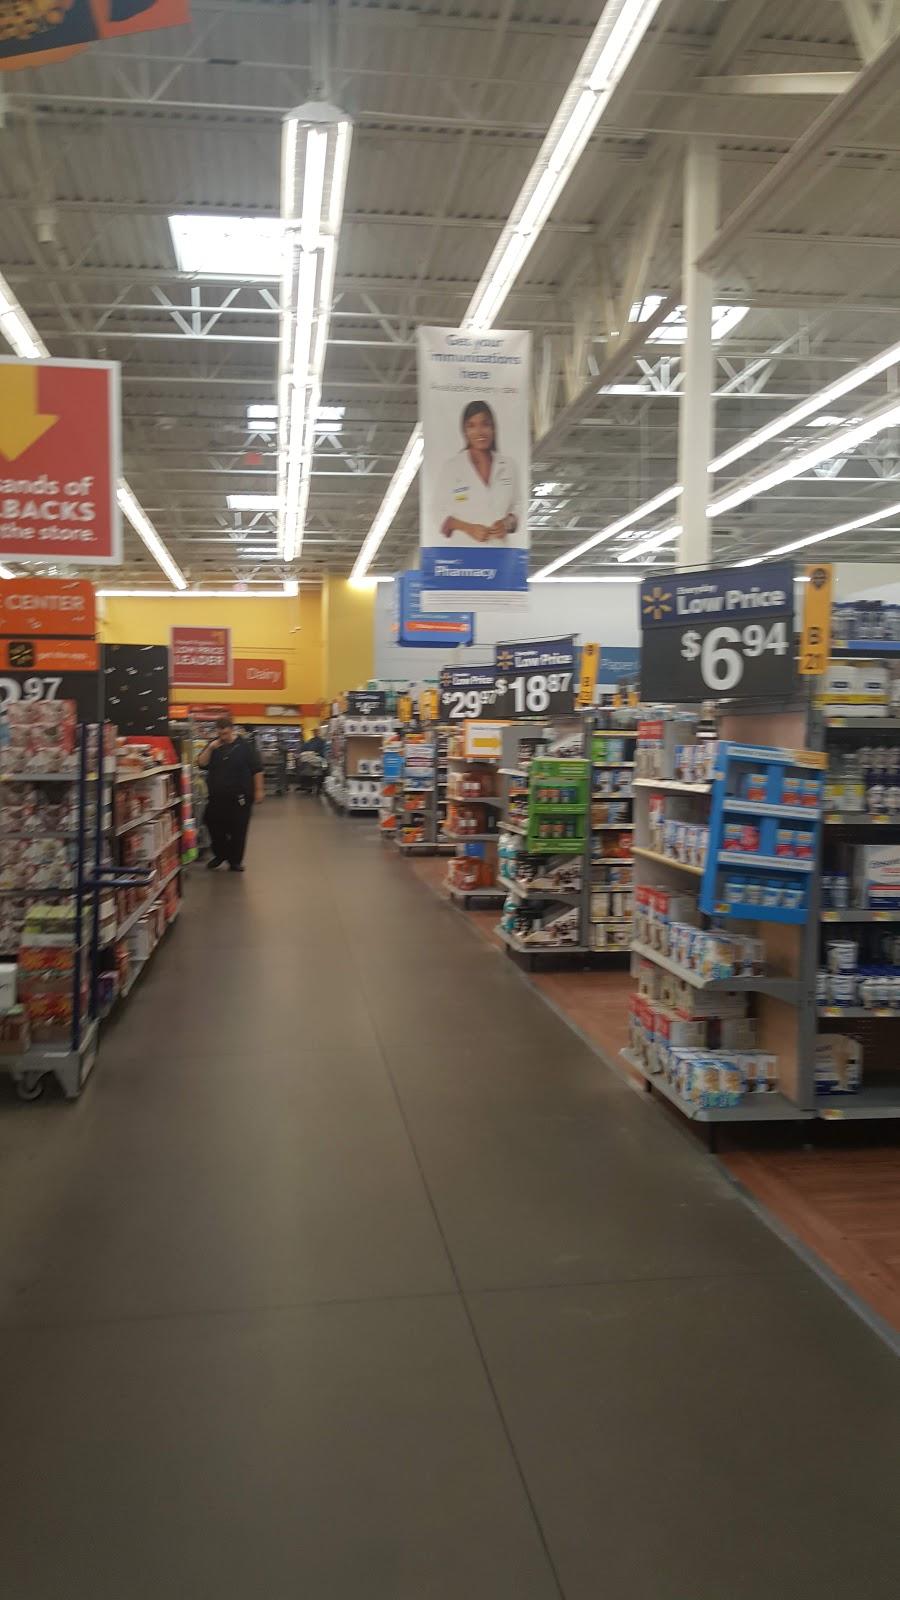 Walmart Supercenter - department store  | Photo 5 of 10 | Address: 16375 Merchants Ln, King George, VA 22485, USA | Phone: (540) 413-3037